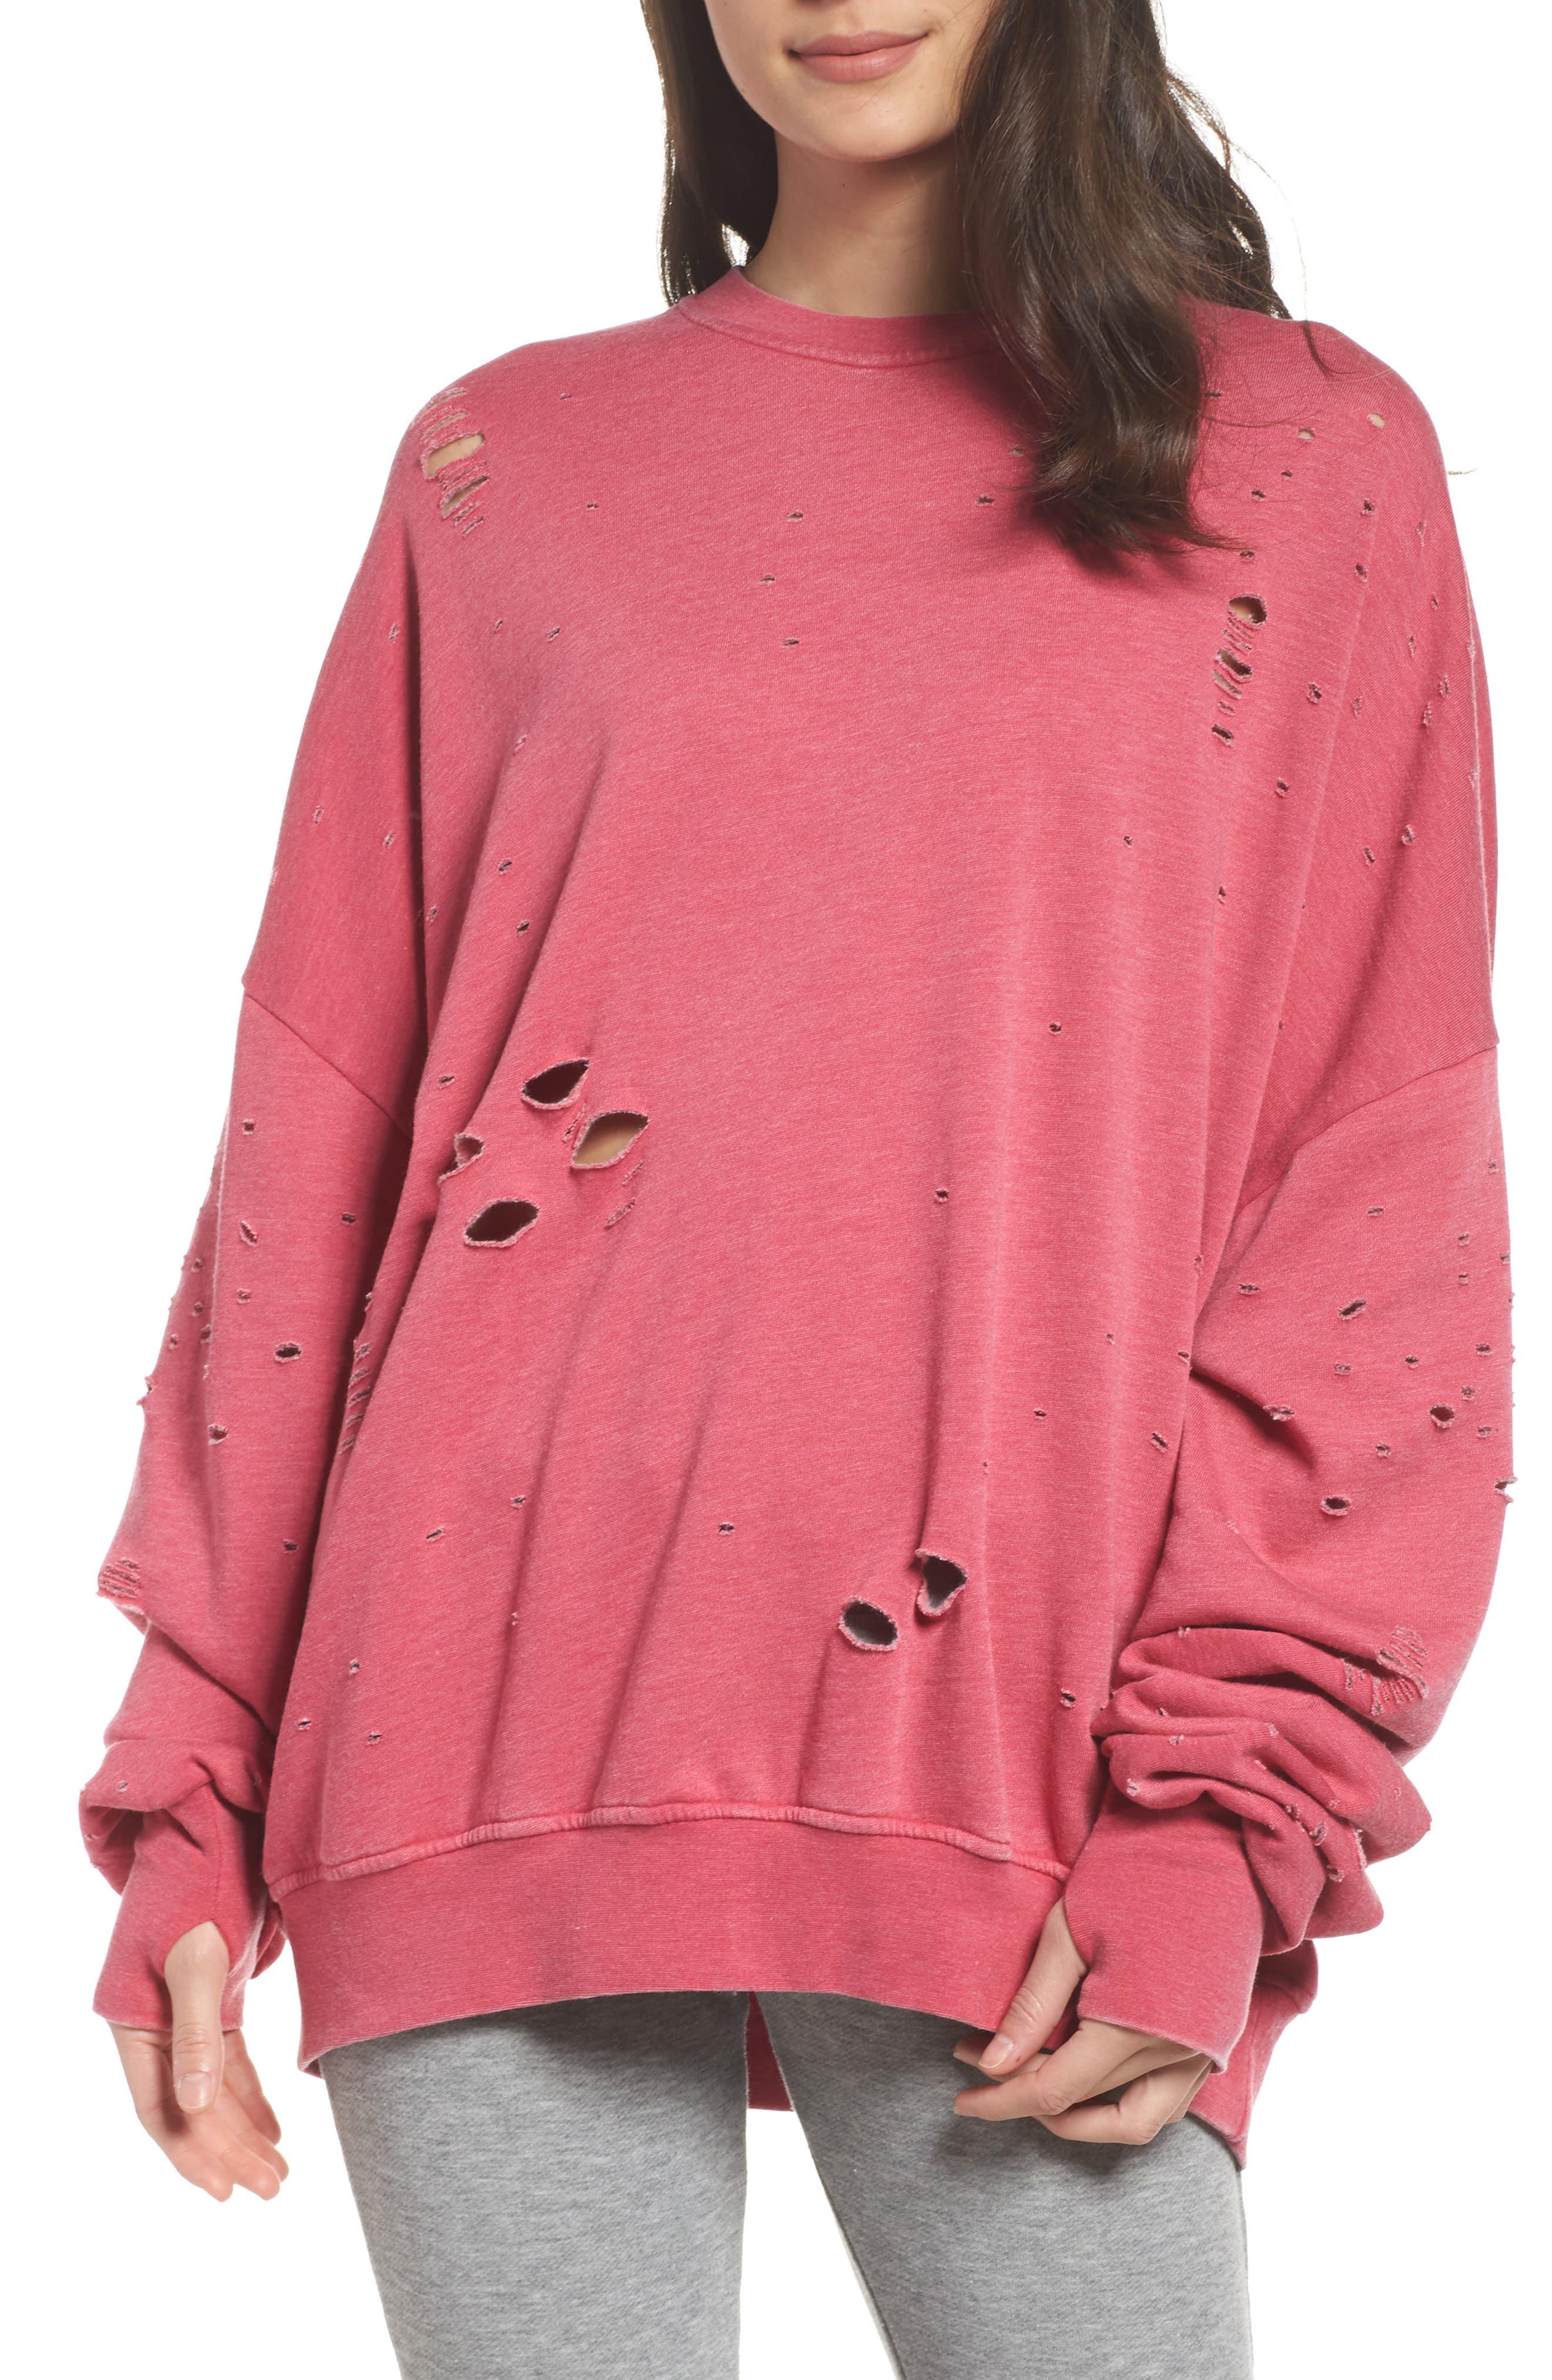 Thrasher Sweatshirt,                         Main,                         color, Flamingo